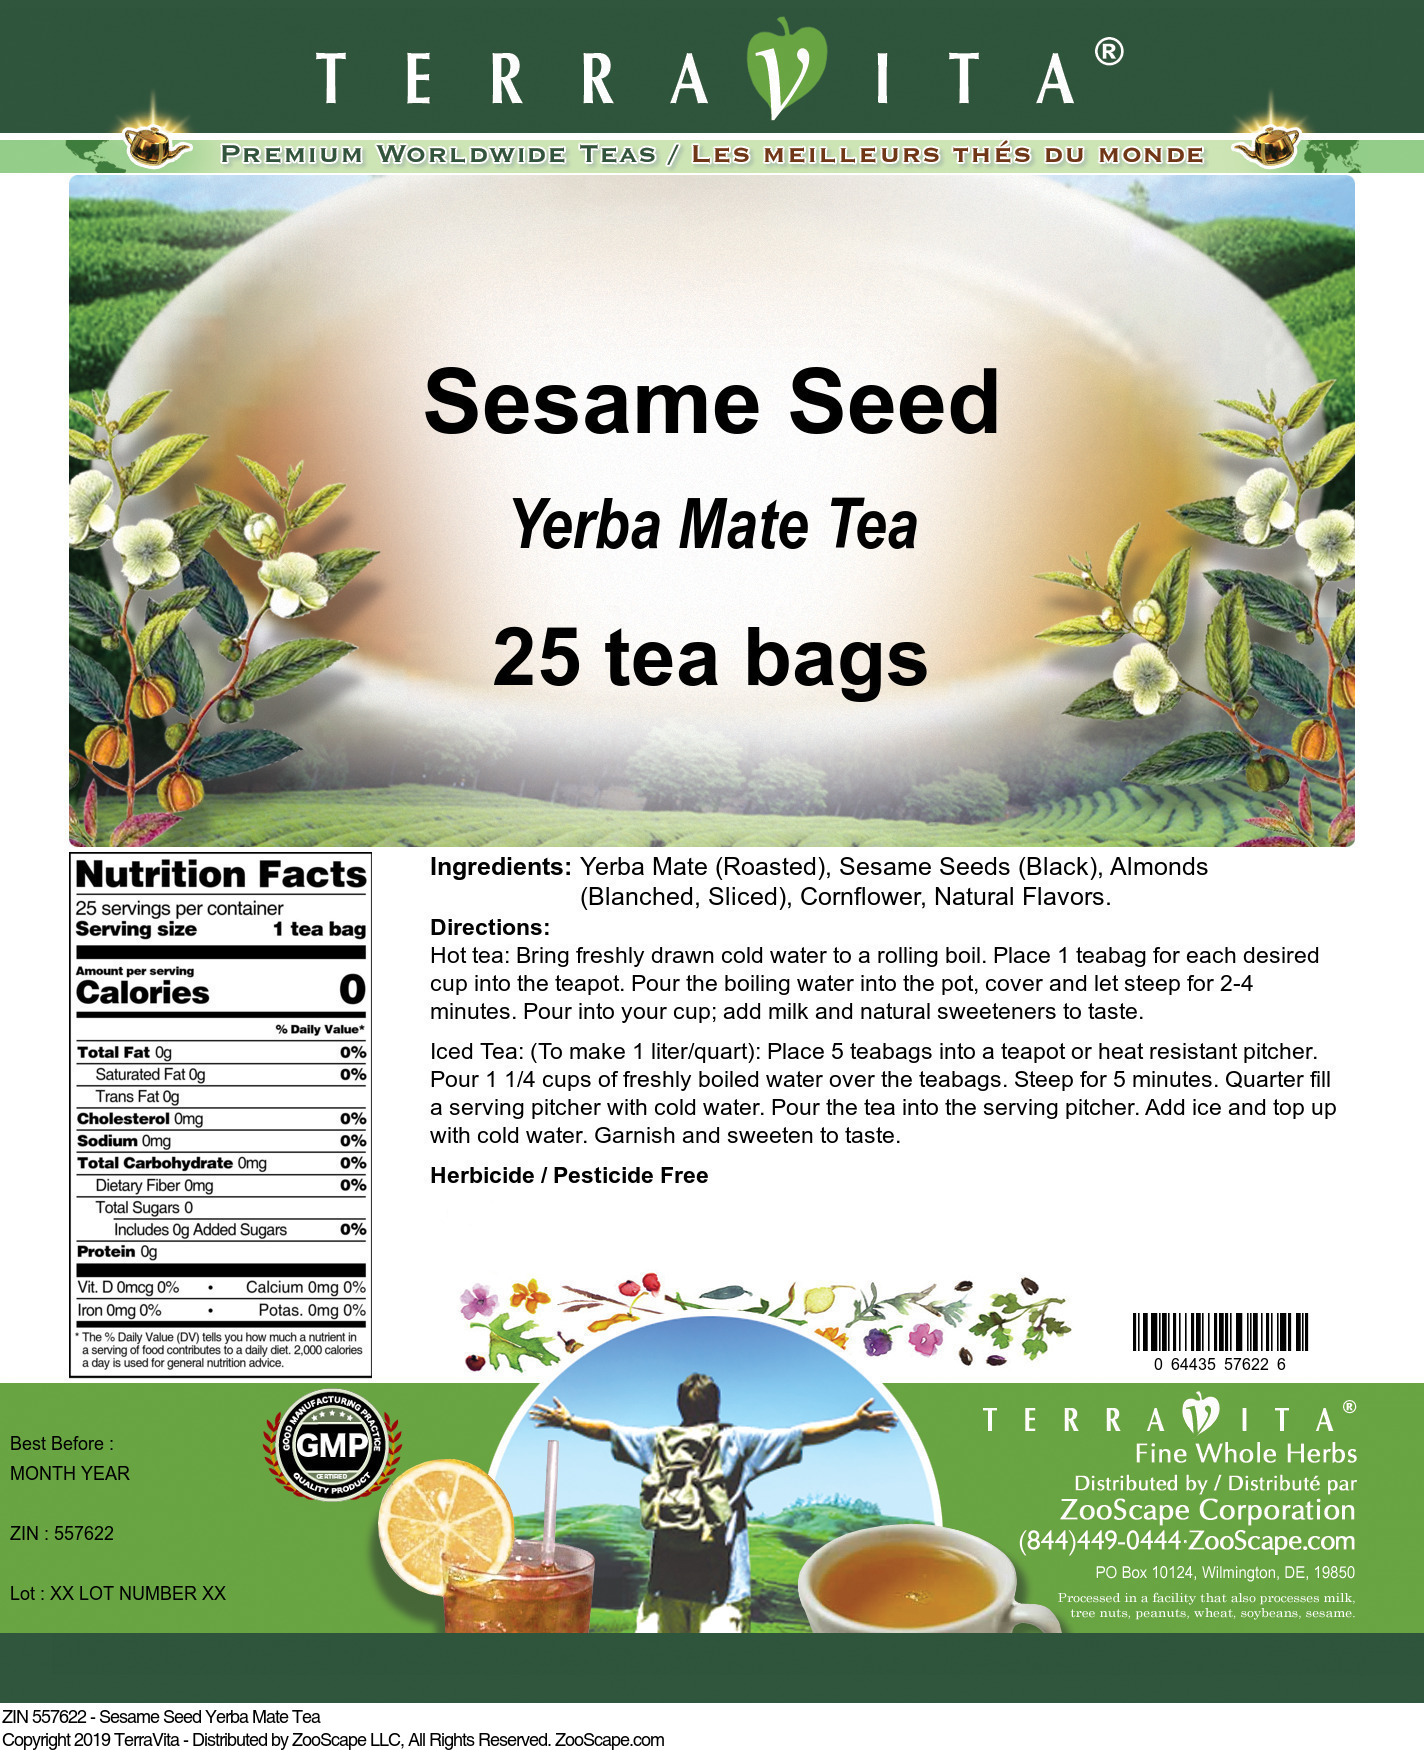 Sesame Seed Yerba Mate